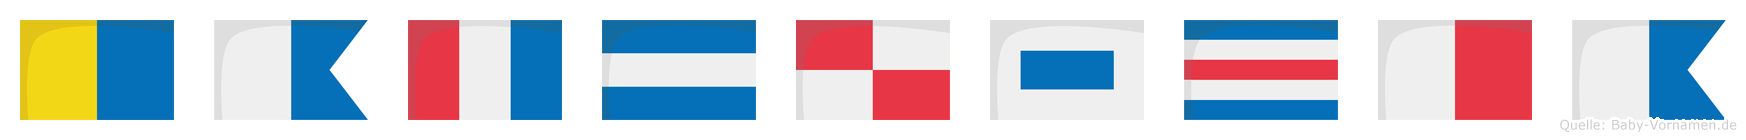 Katjuscha im Flaggenalphabet